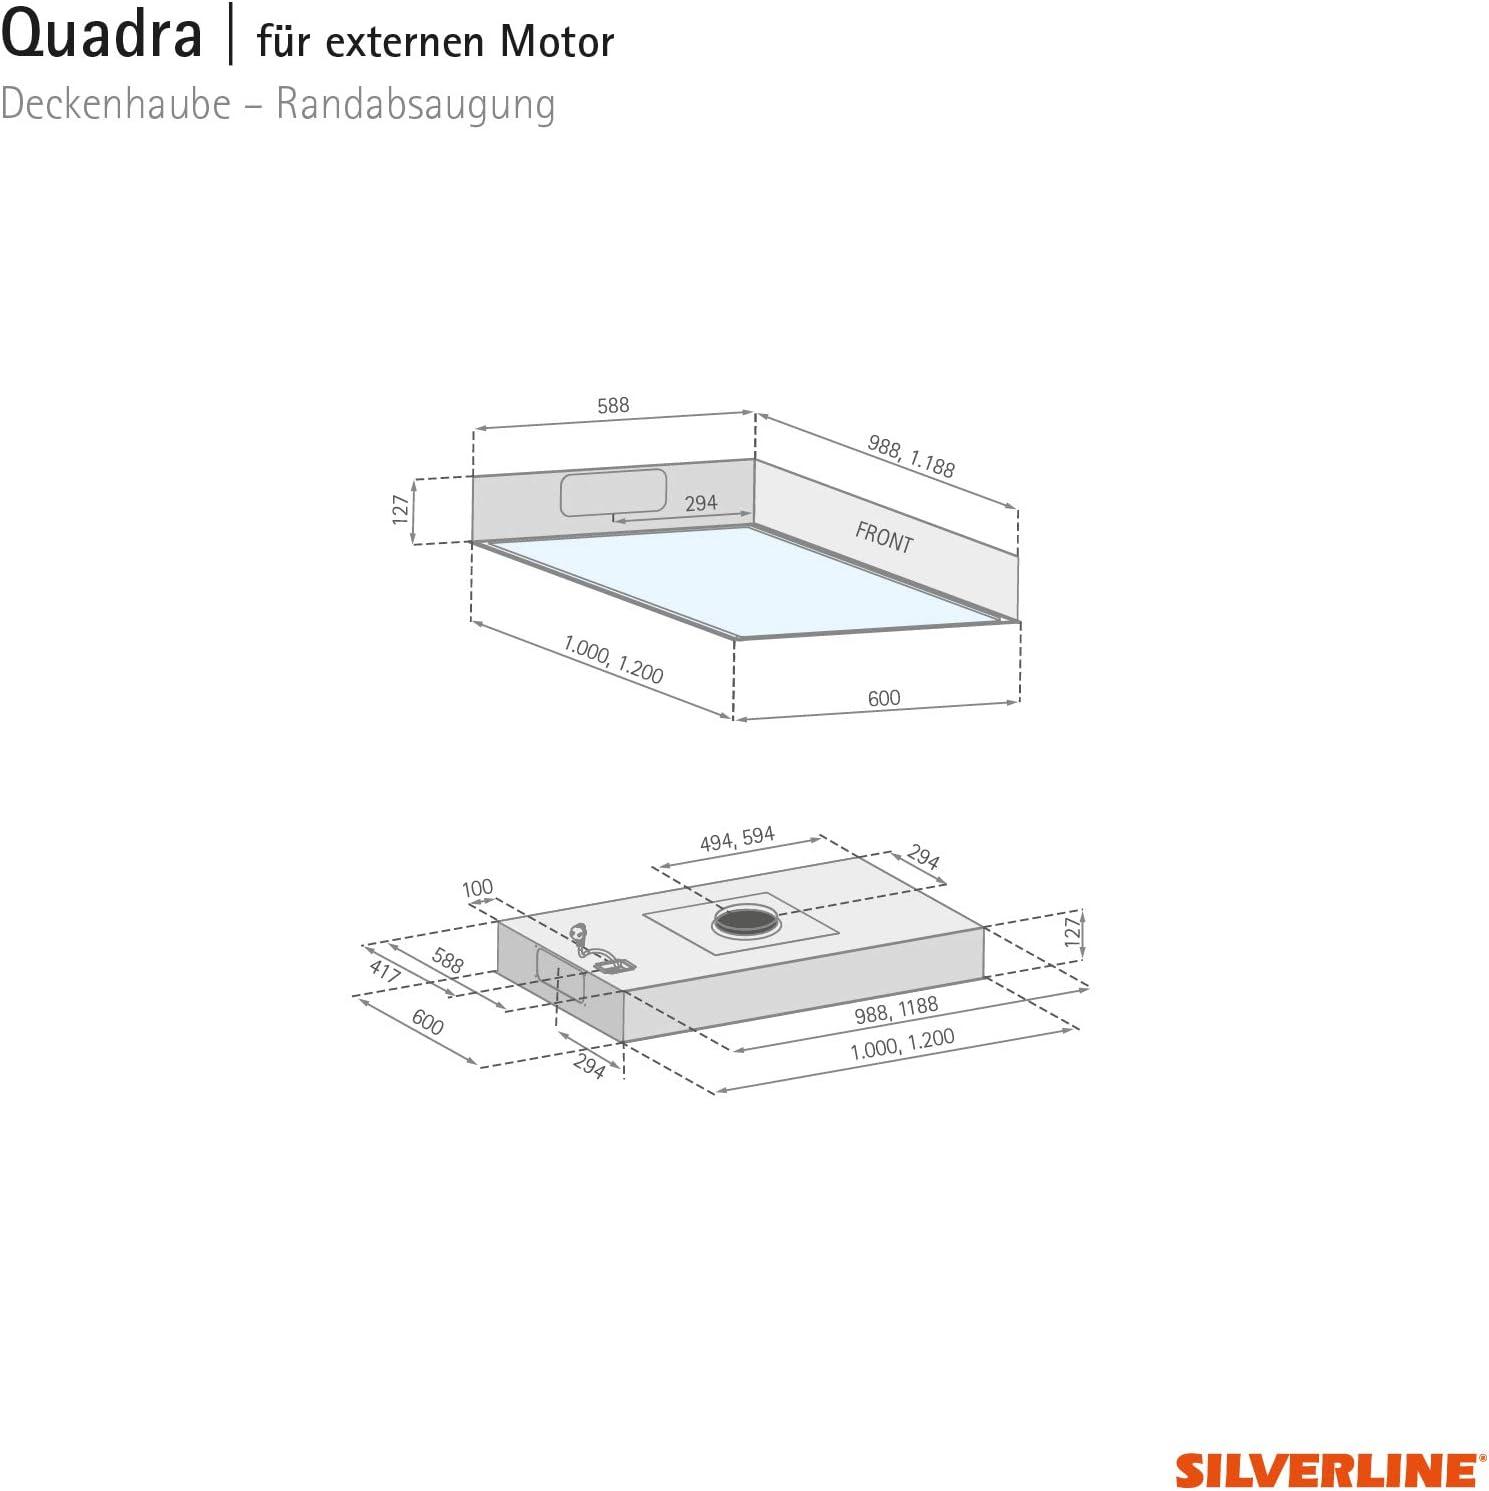 SILVERLINE QUD 124 S Quadra Deckenhaube//Dunstabzugshaube//Inselhaube 120 cm//C